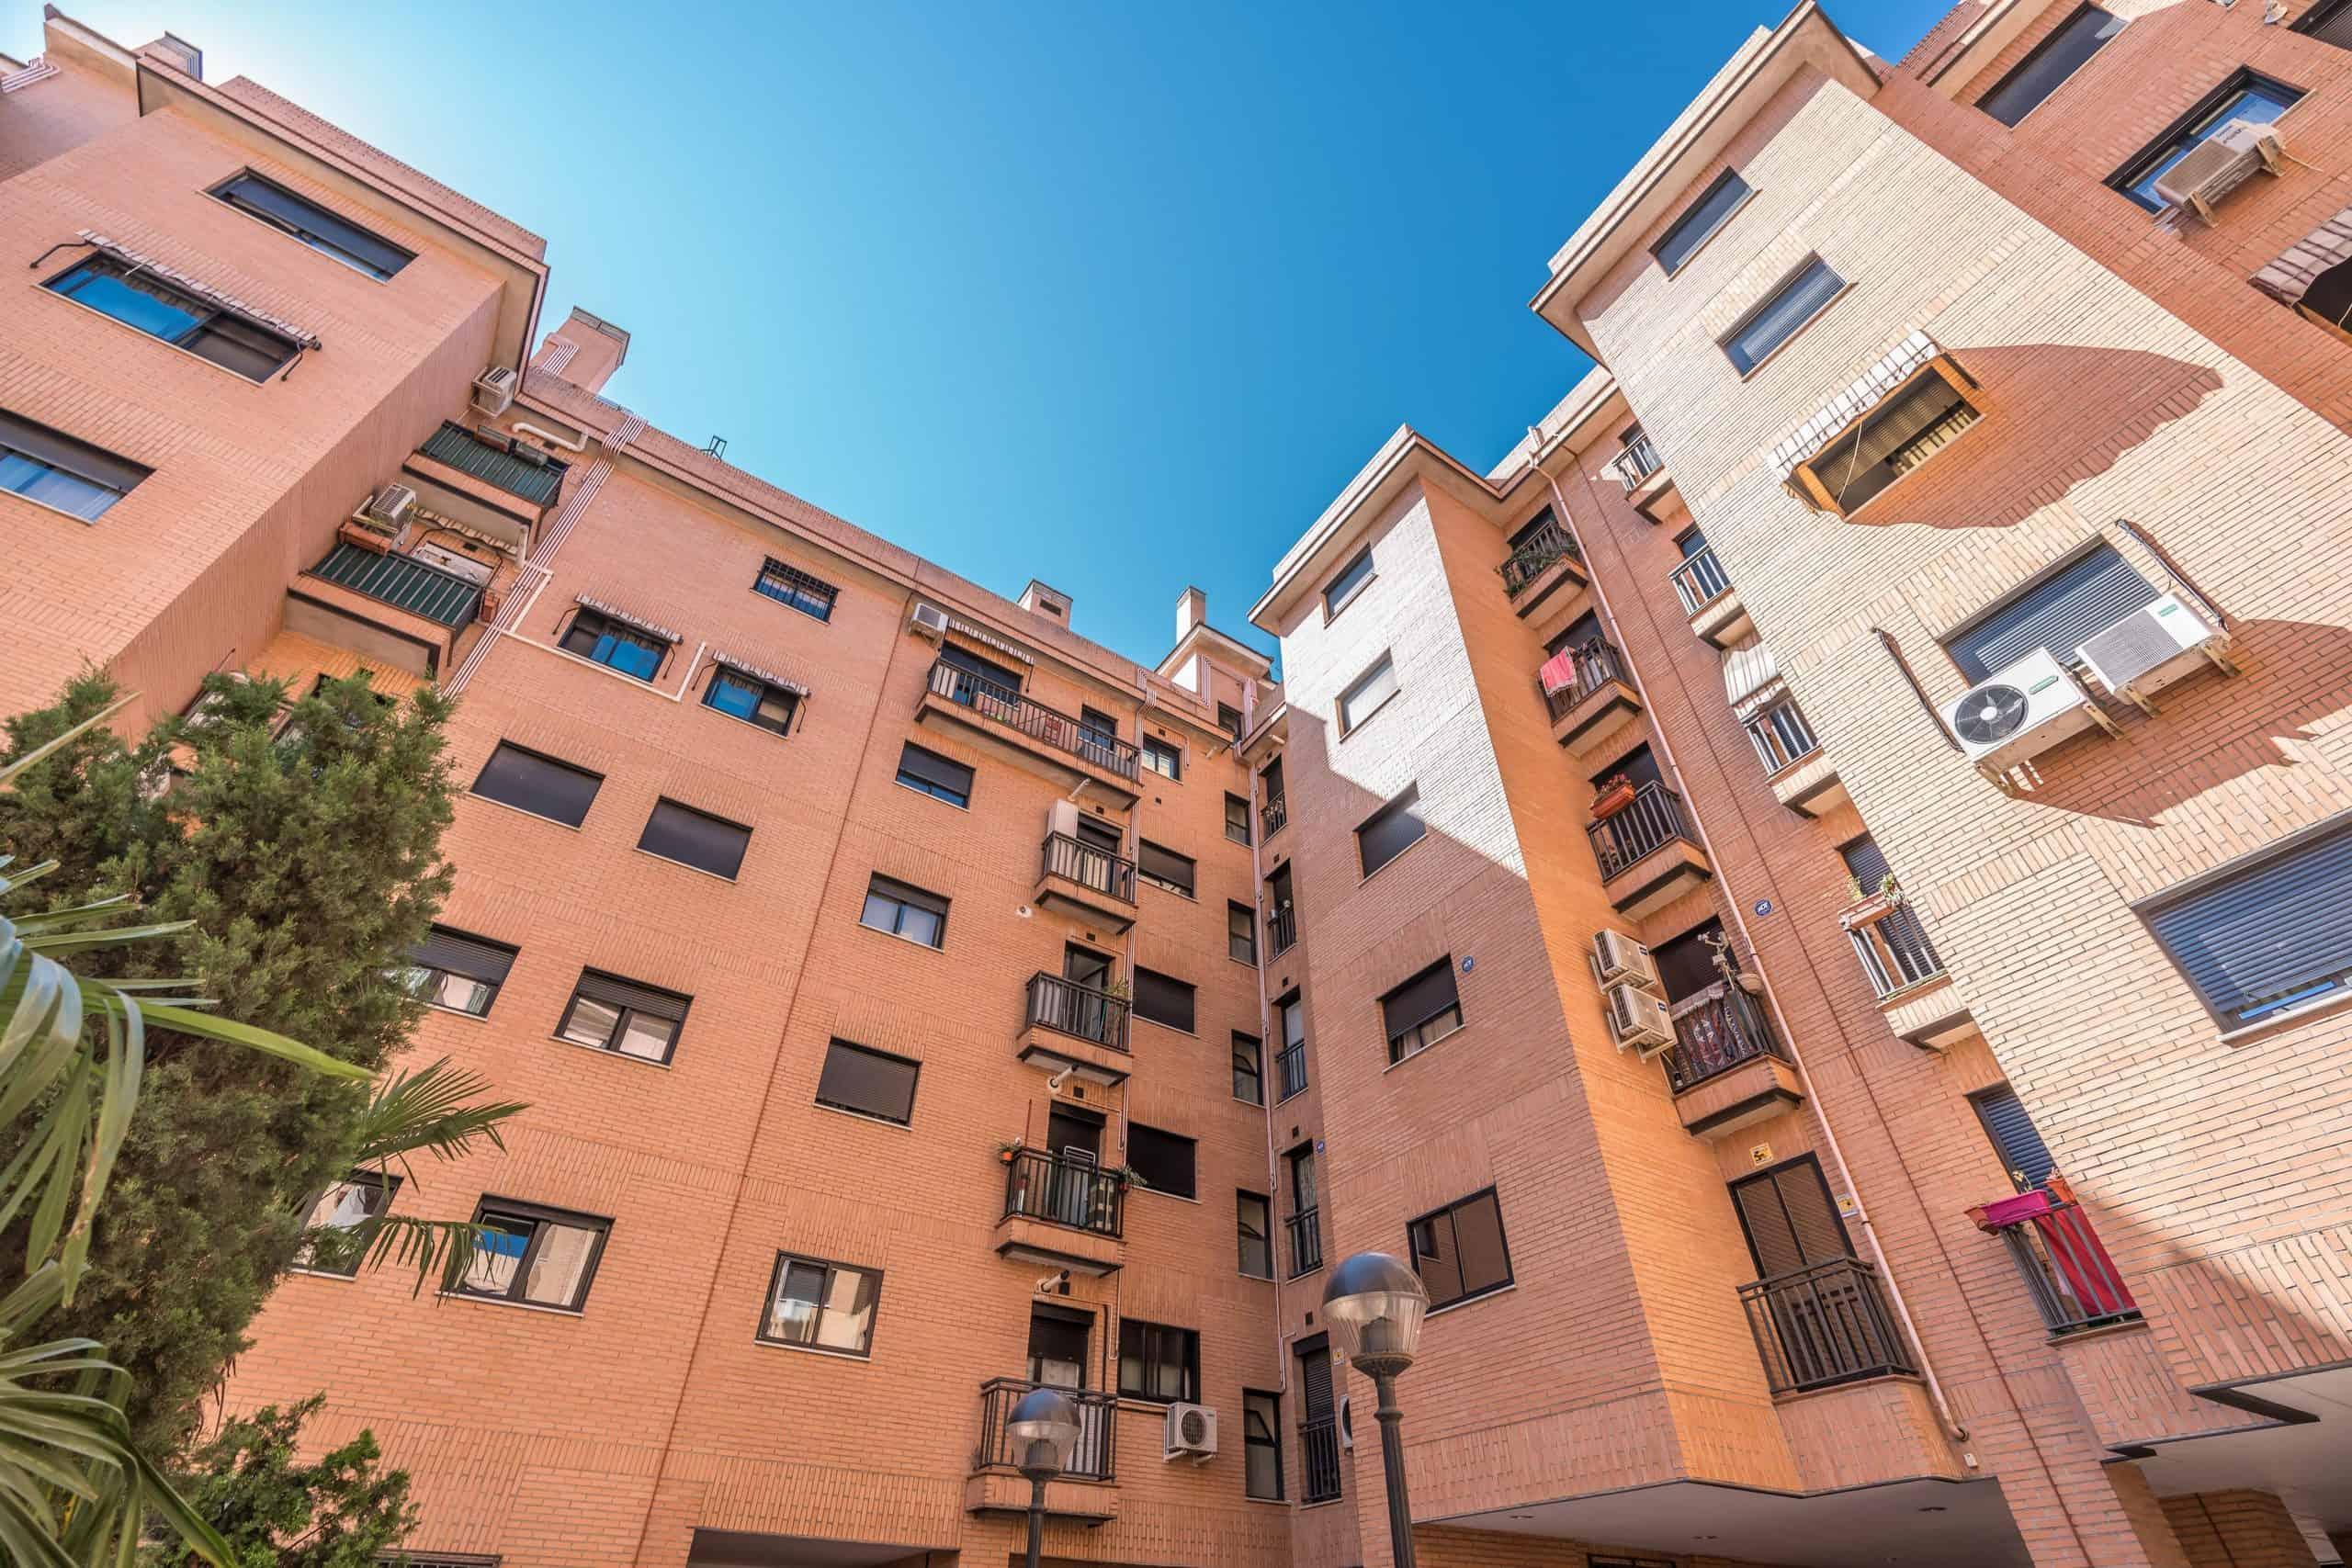 Agencia Inmobiliaria de Madrid-FUTUROCASA-Zona ARGANZUELA-EMBAJADORES-LEGAZPI13 ZONAS COMUNES (3)